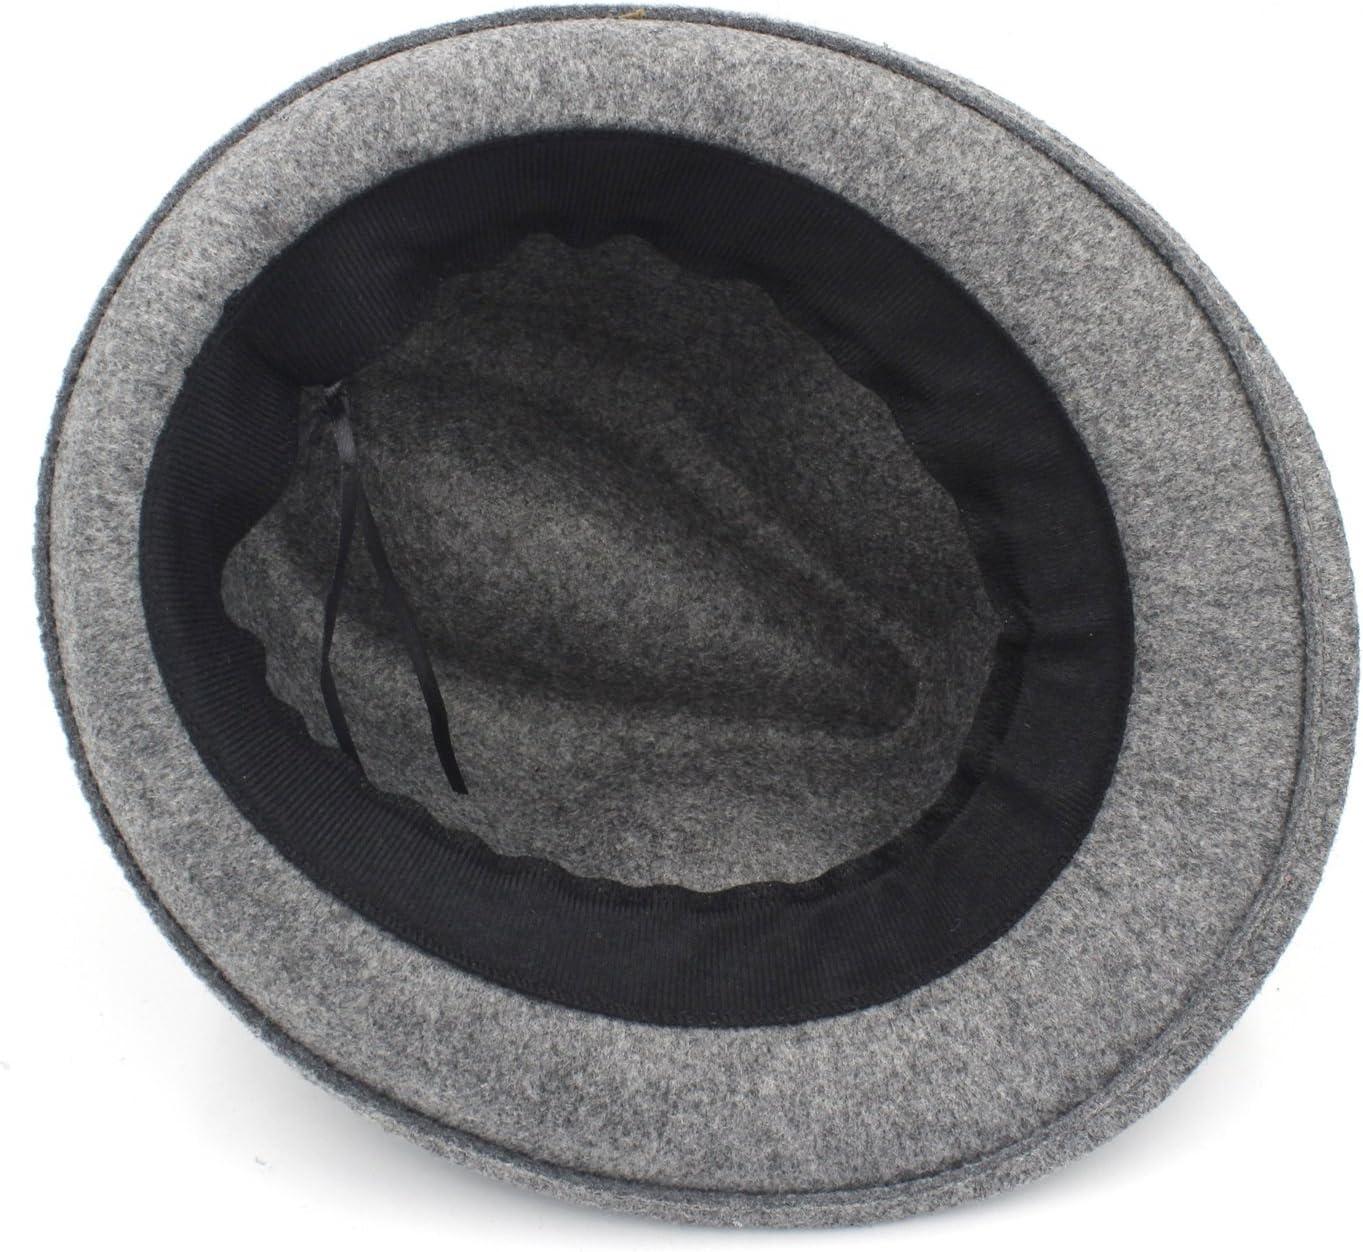 Women Temperament Hat Women Men Chapeau Femme Fedora Hat for Gentlemen and Ladies Fashion Woolen Fedora Hat (Color : Black, Size : 57-58cm)